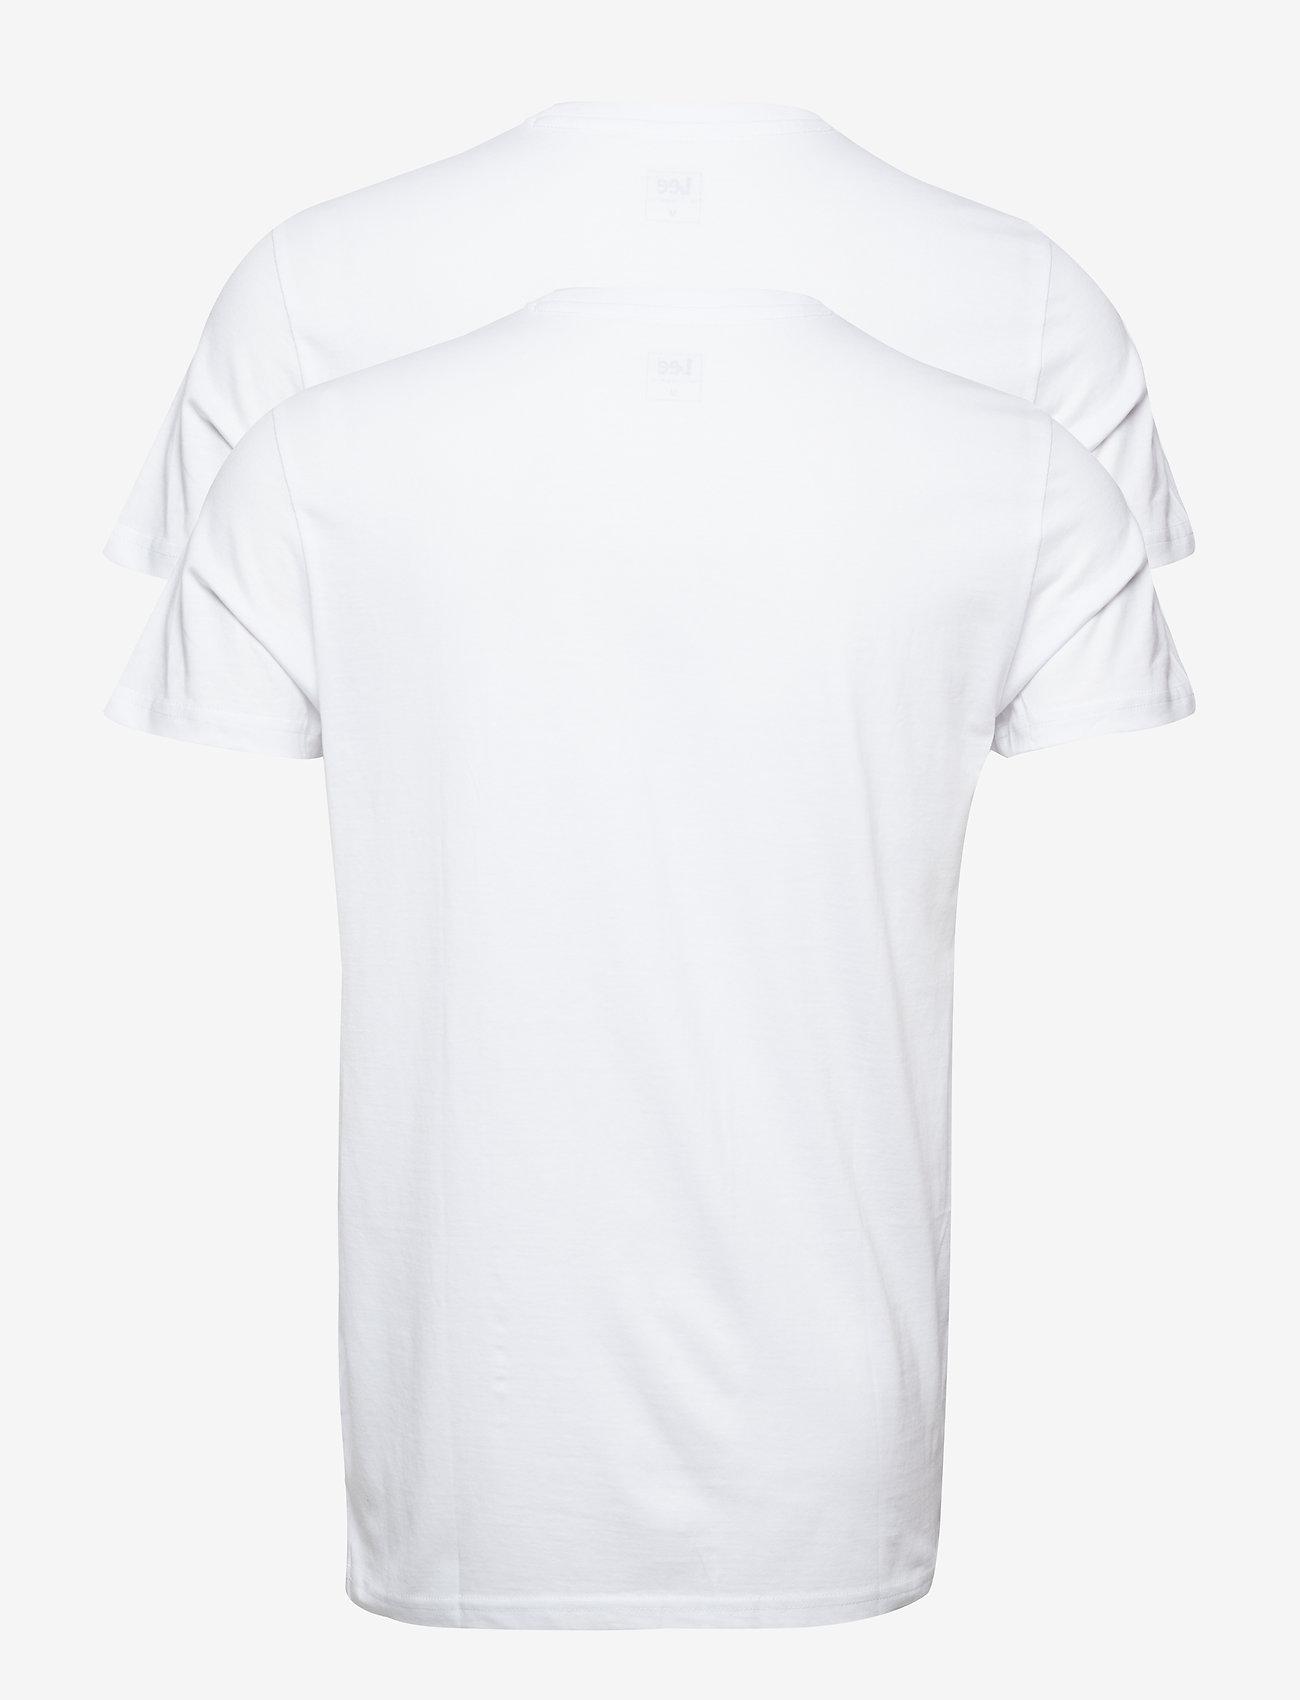 Lee Jeans TWIN PACK CREW- T-shirts Y21AJMoN j7X2g nwQsMcn2